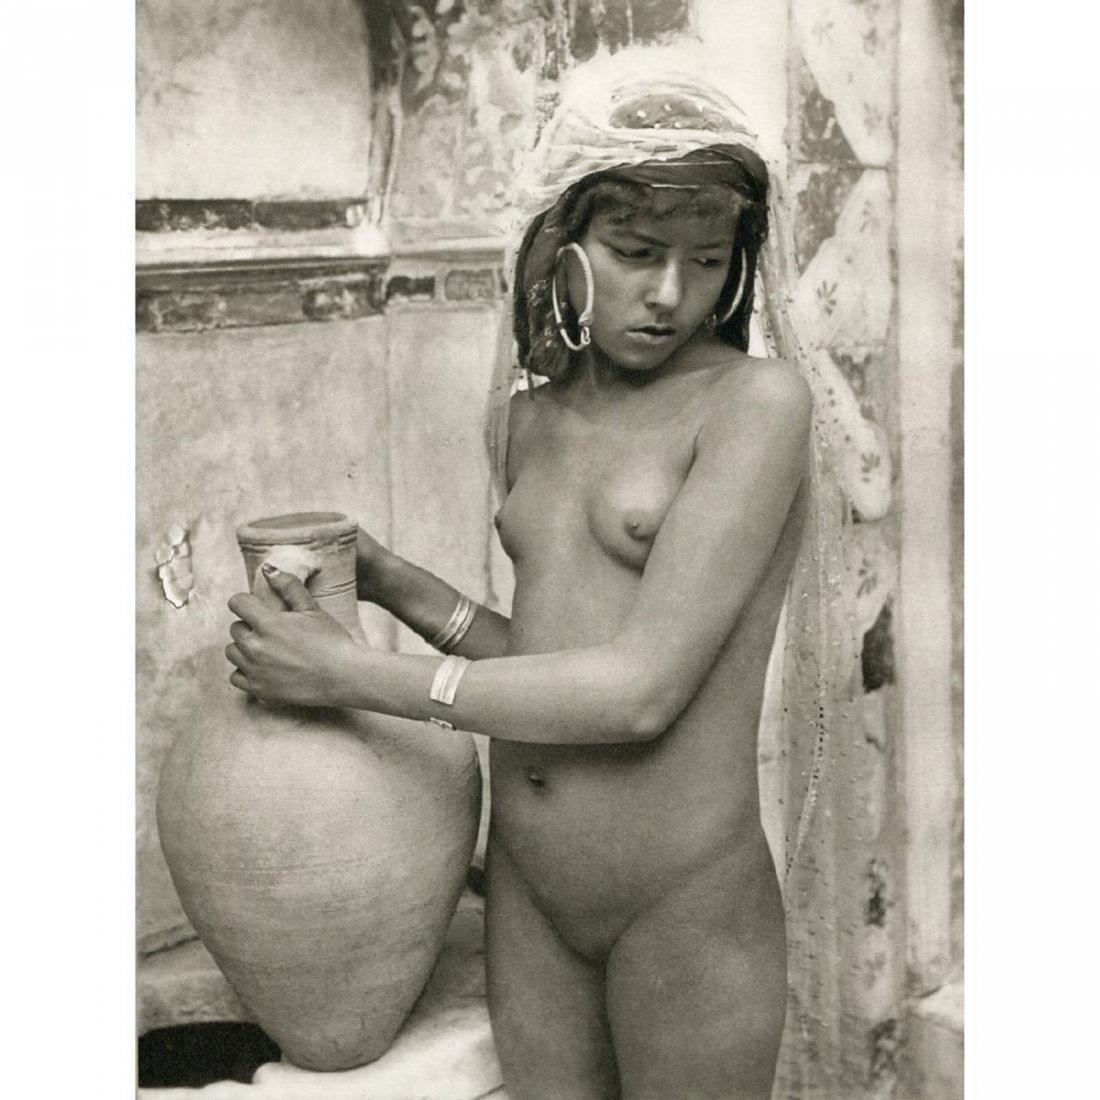 LEHNERT & LANDROCK - Bedouin Woman - 2